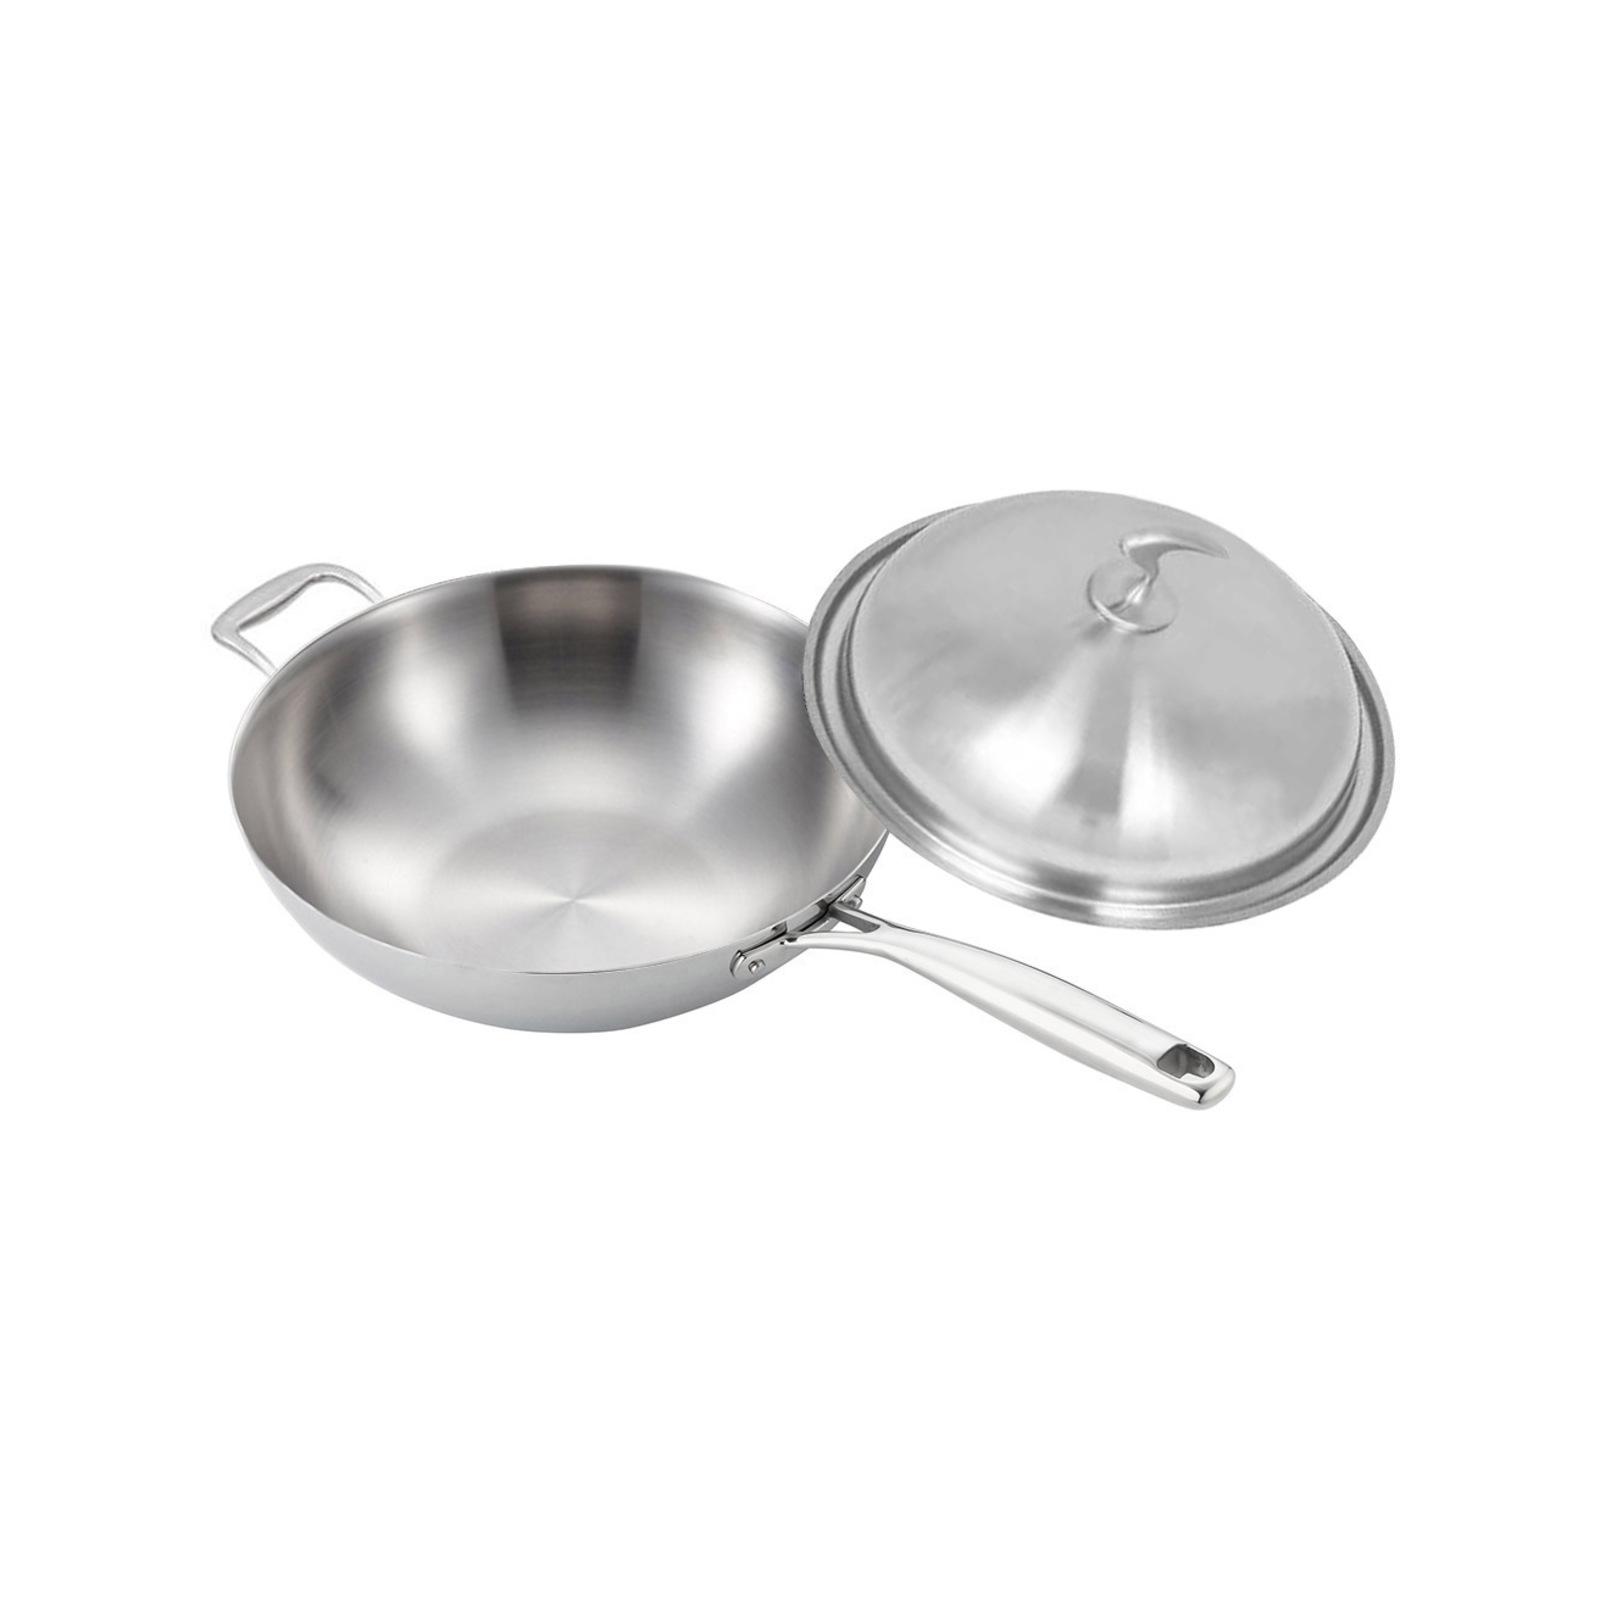 SOGA 18/10 Stainless Steel Fry Pan 34cm Frying Pan Top Grade Skillet with Helper Handle and Lid